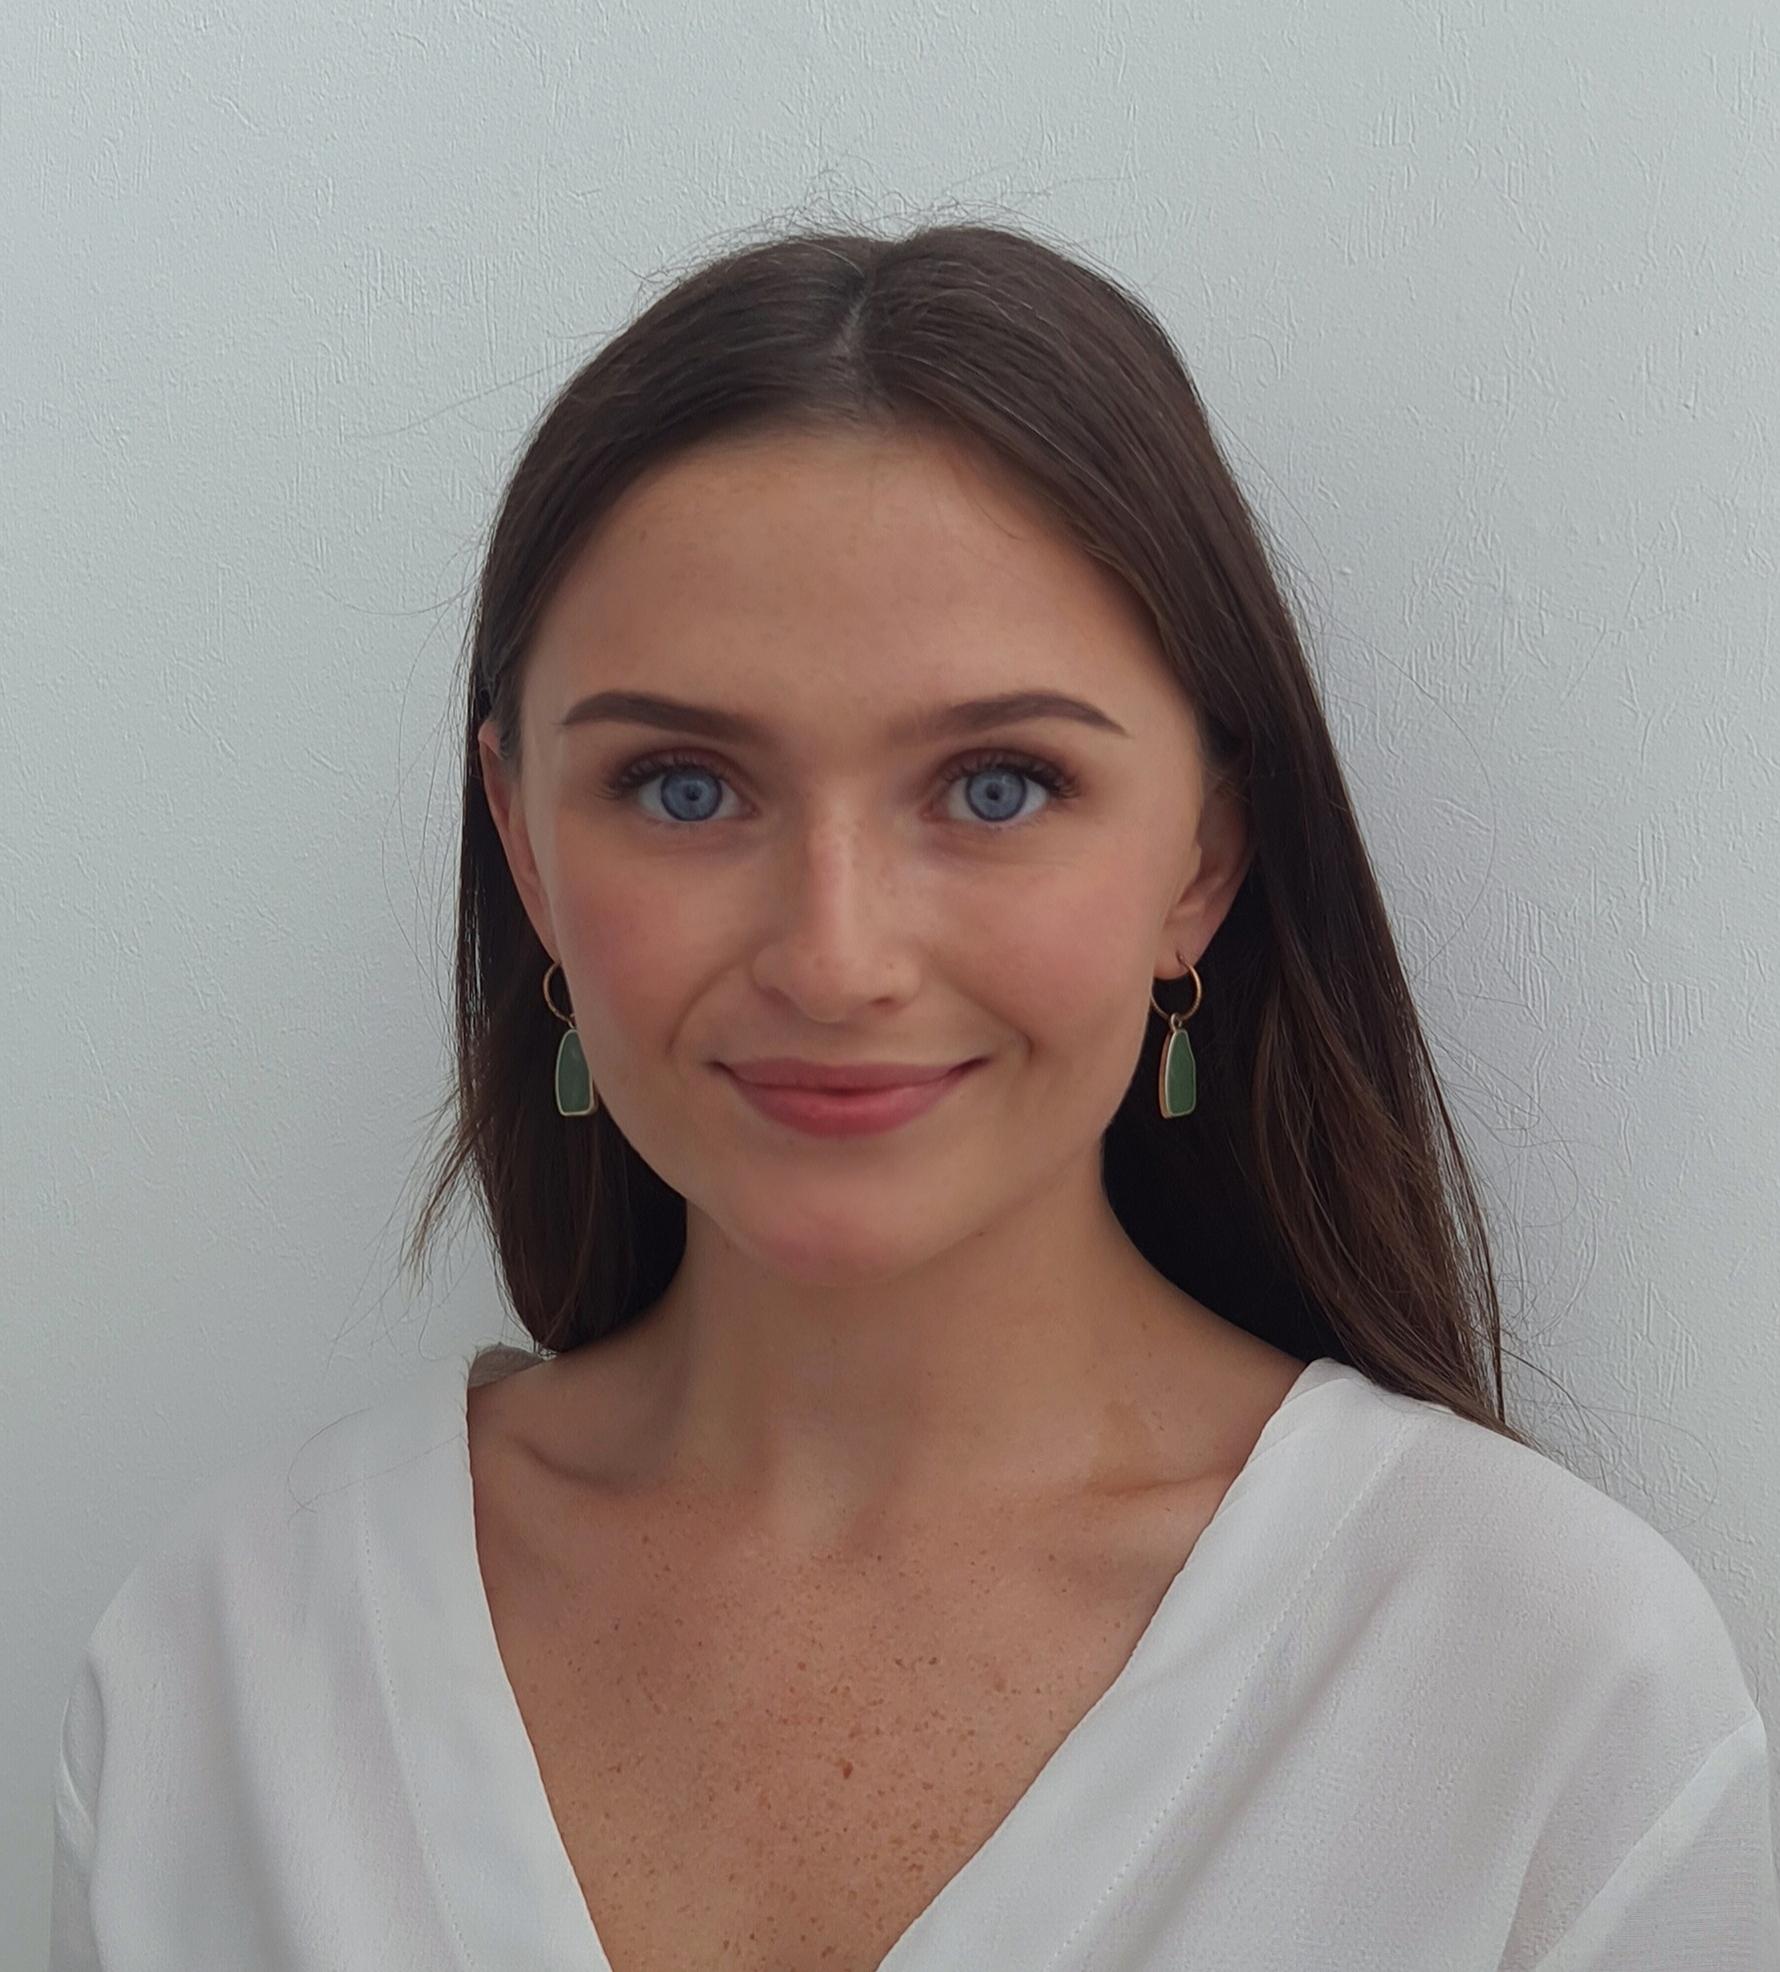 Avatar of Emily Hall